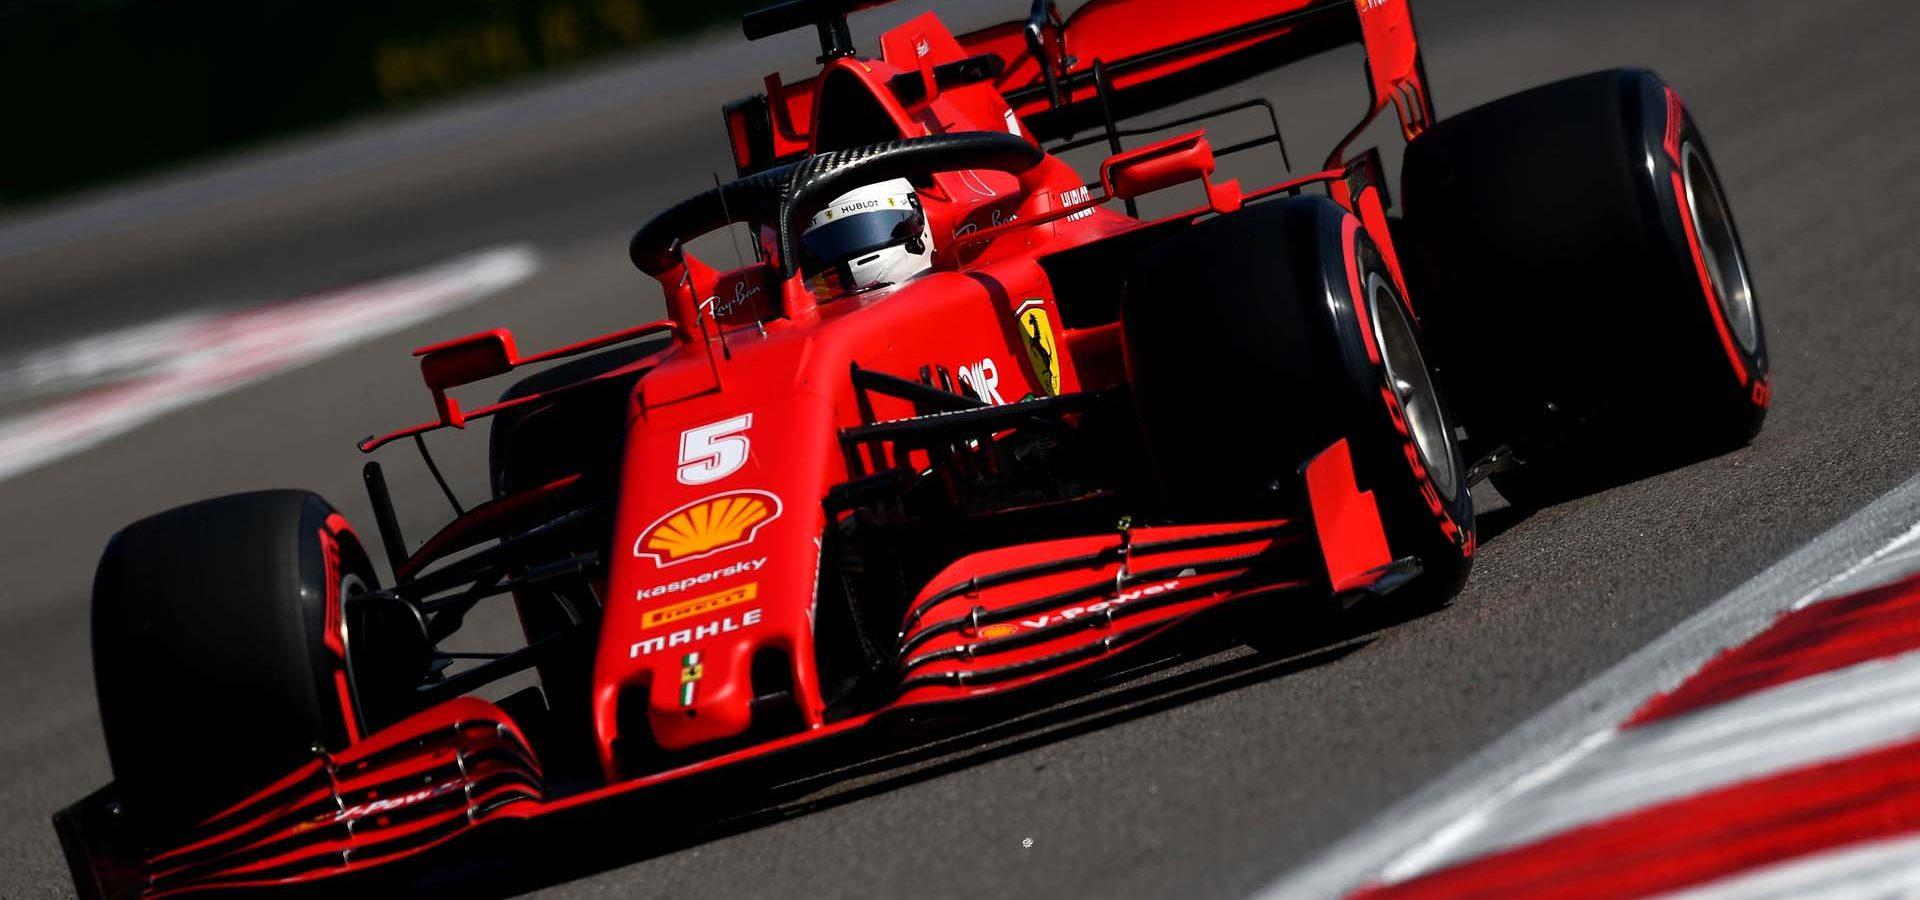 GP RUSSIA F1/2020 -  VENERDI 25/09/2020    credit: @Scuderia Ferrari Press Office Sebastian Vettel